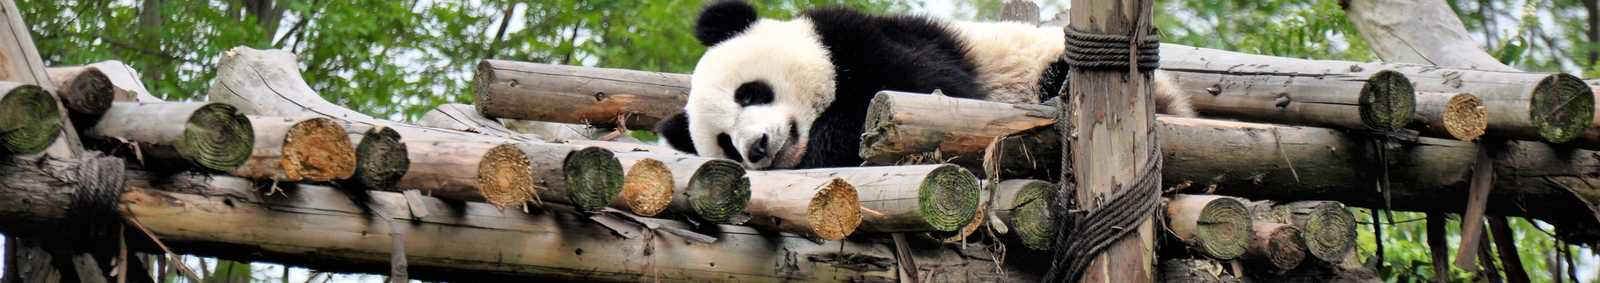 Giant Panda, Chengdu Sanctuary